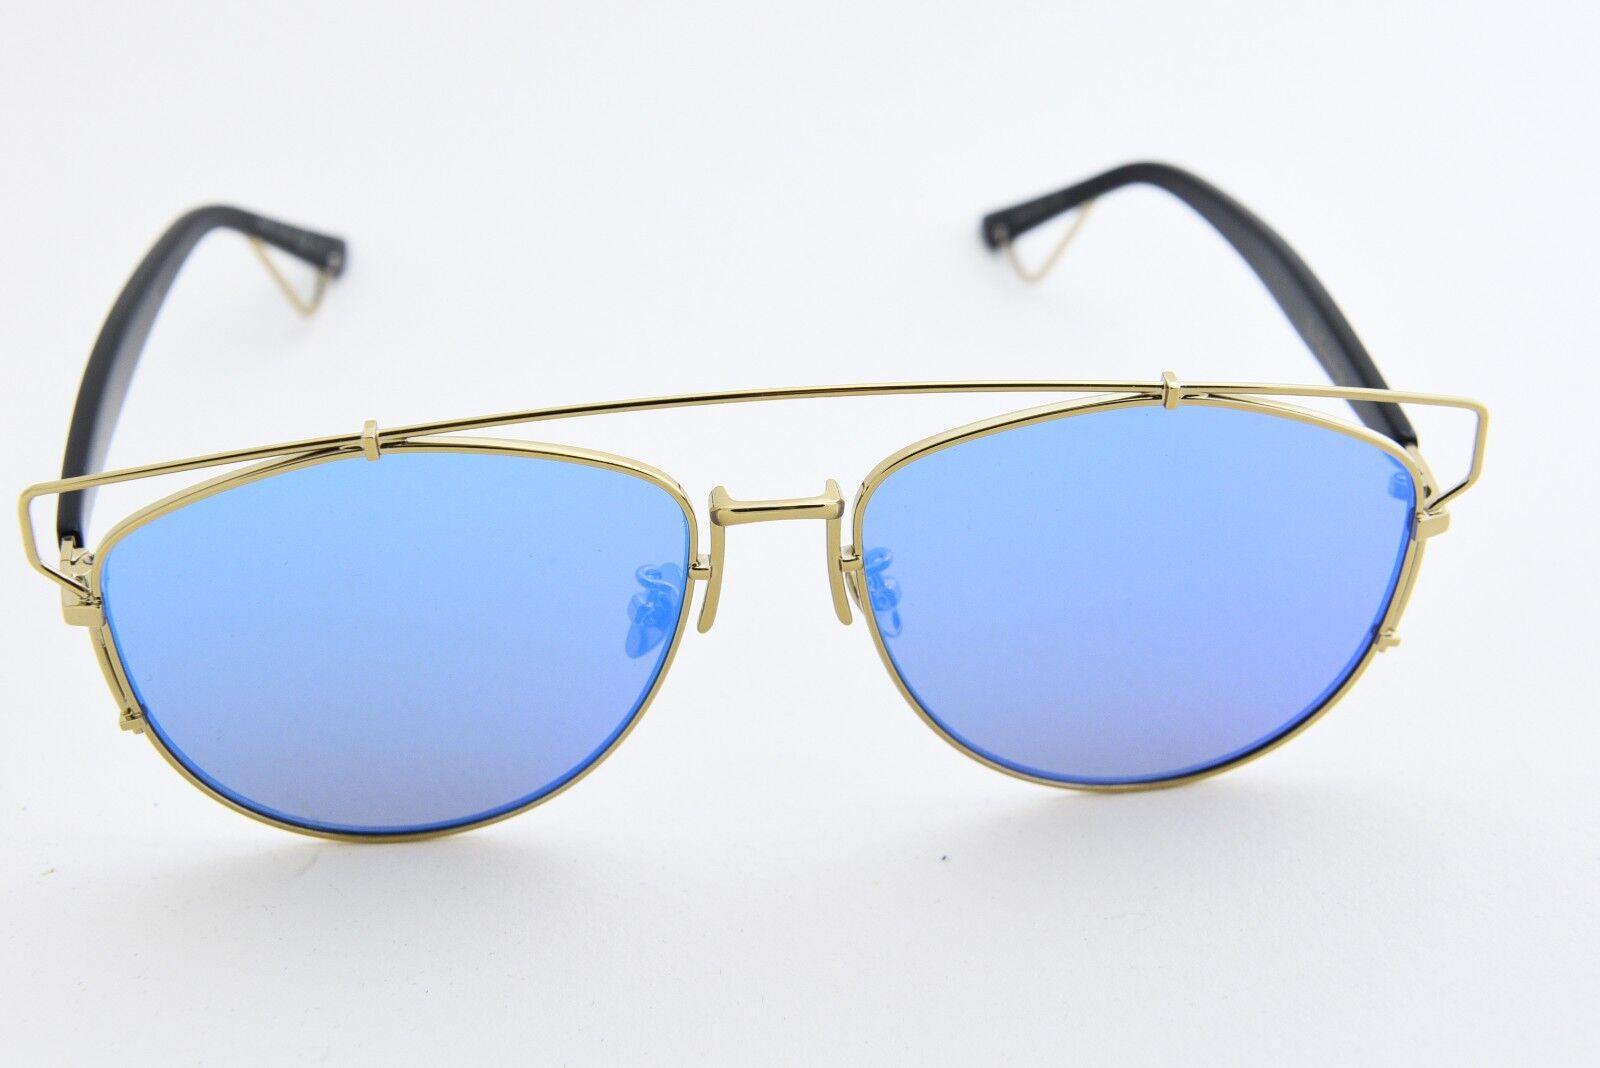 27b9069c641 Christian Dior Technologic Rhl 2a Gold Black blue Mirror Sunglasses ...